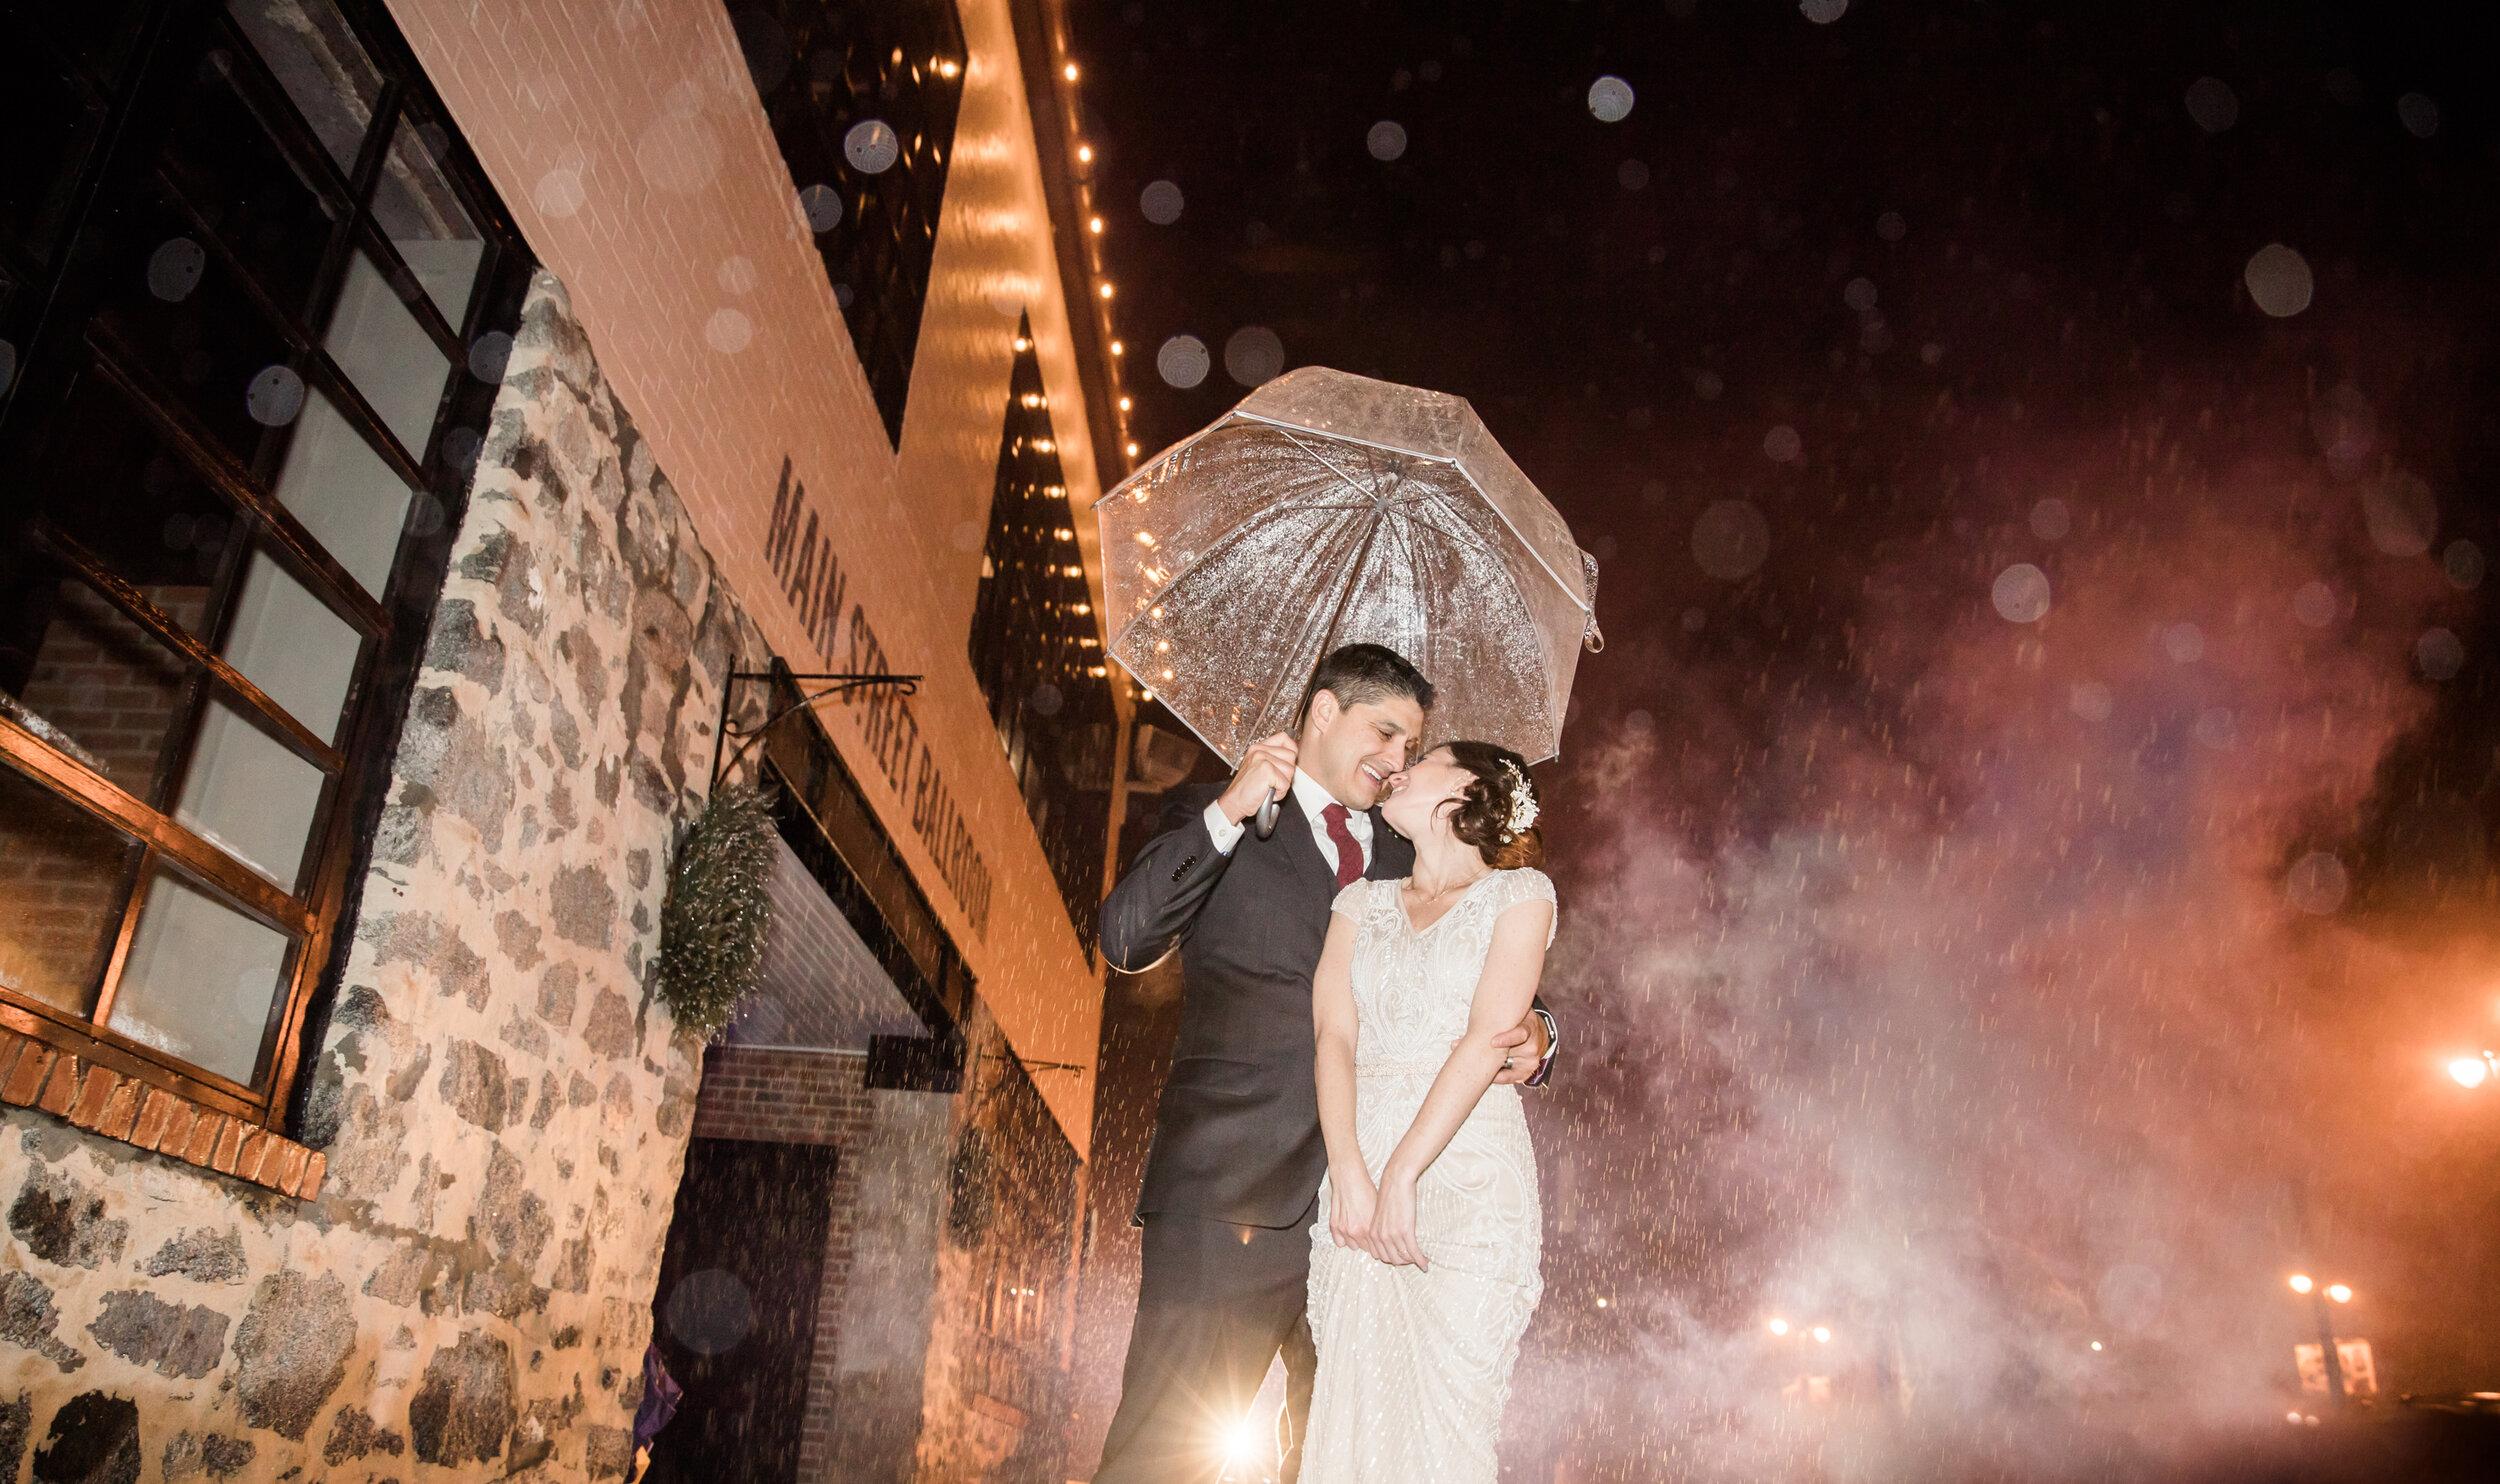 Tips for Winter Wedding at Main Street Ballroom Shot by Megapixels Media Photography in Ellicott City Wedding Photographer Best Baltimore Wedding Photographers Winter Wedding Dress (1 of 64).jpg